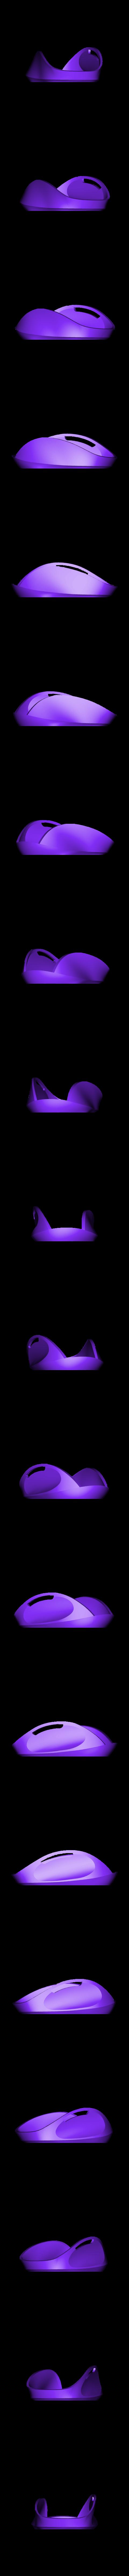 azuro_base_noinsert.stl Download free STL file Azuro Computer Mouse • 3D printer model, MaxMKA